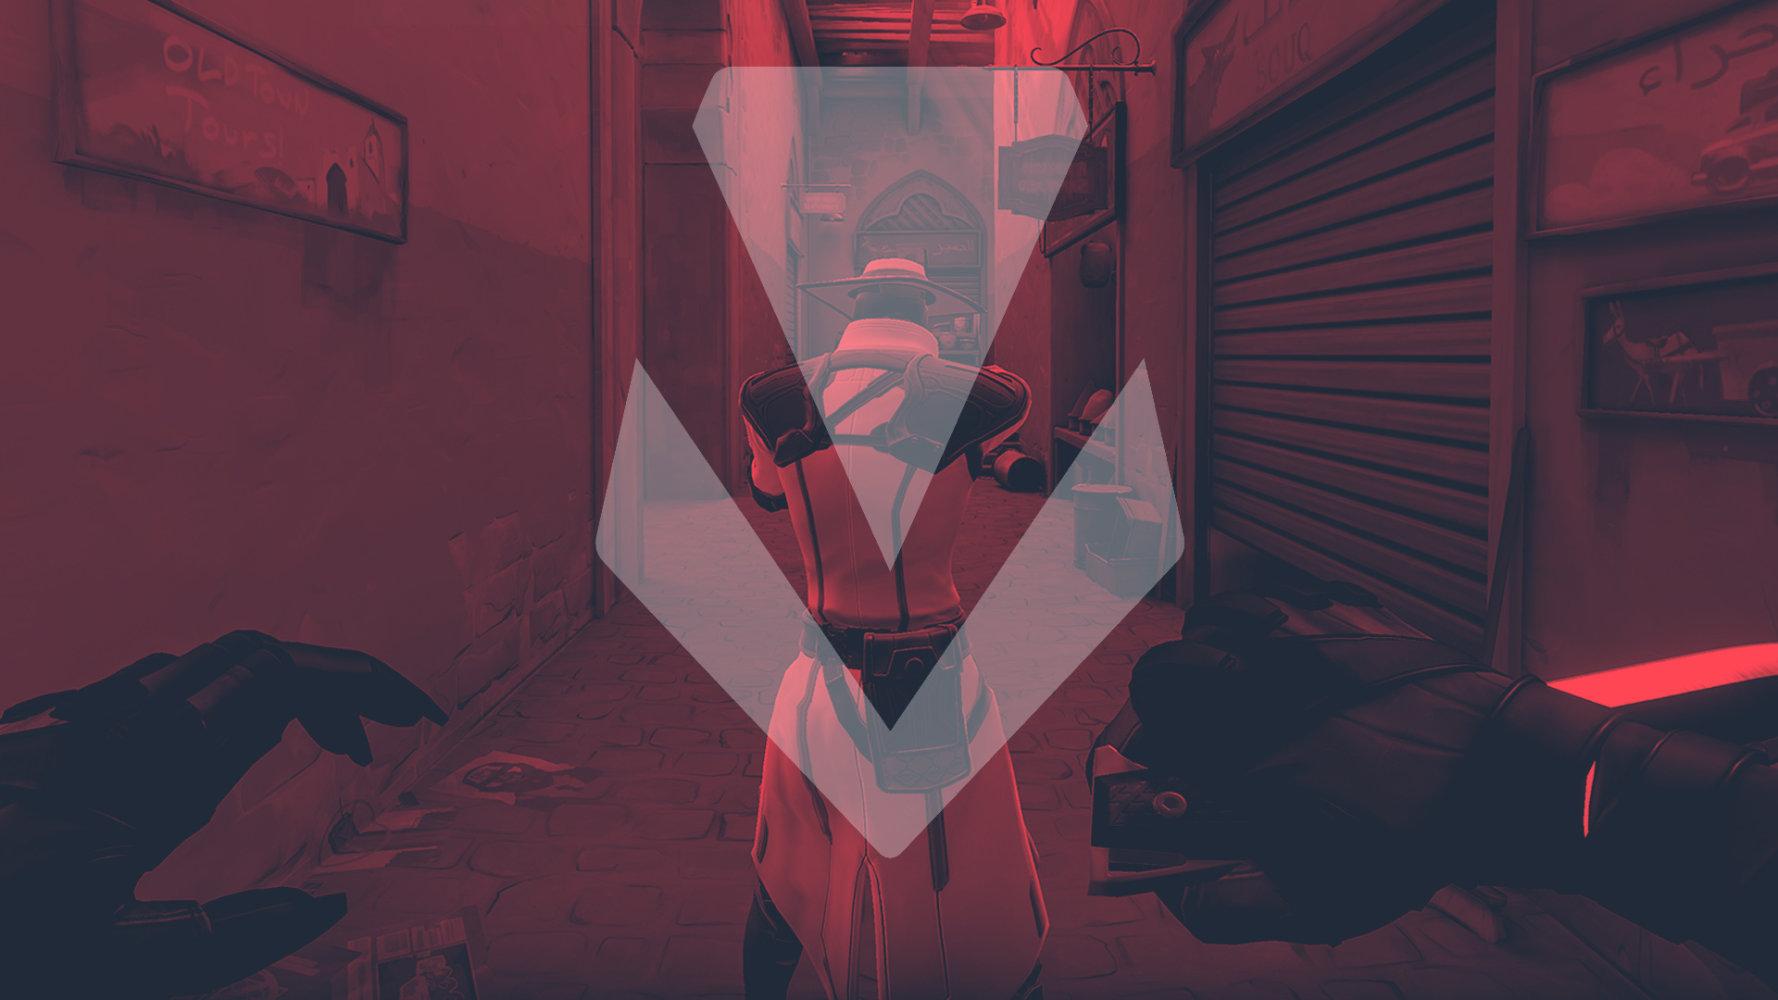 Ready_Vanguard_image